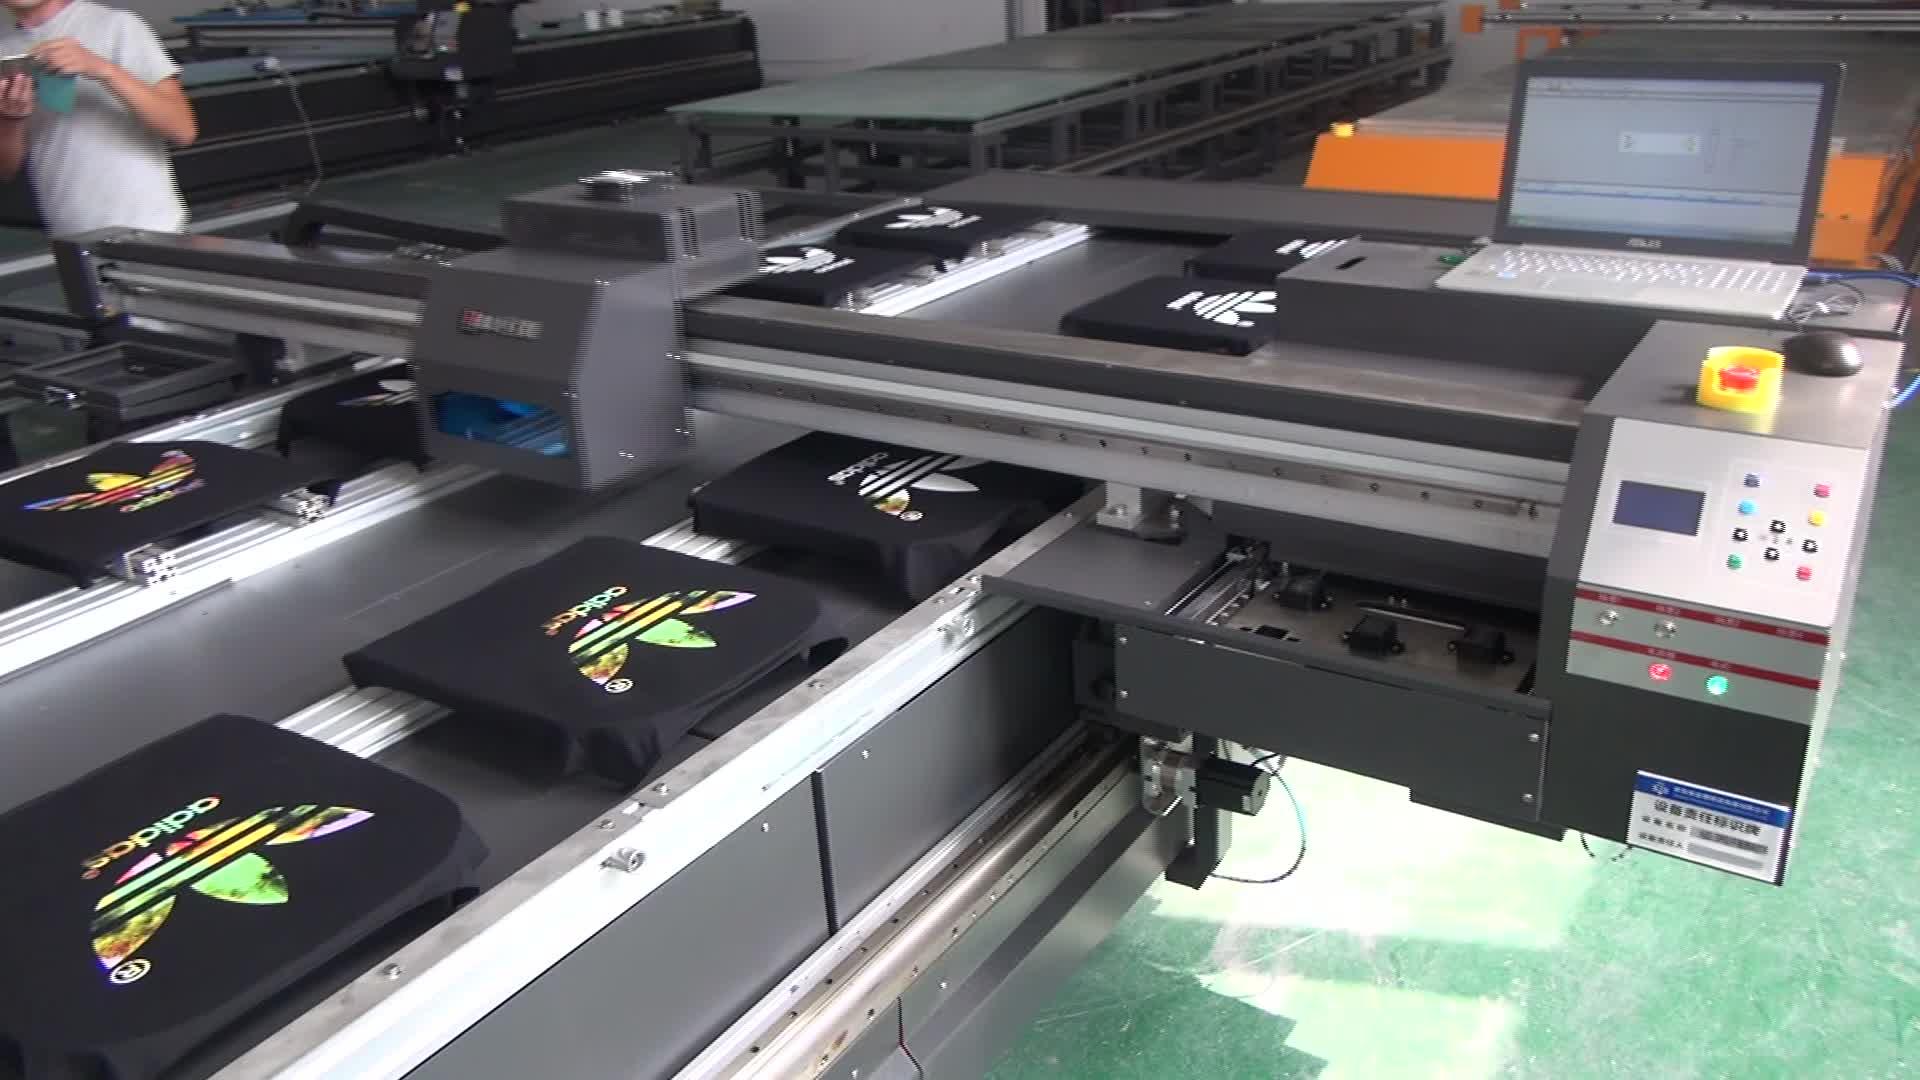 Direct to garment digital inkjet printer